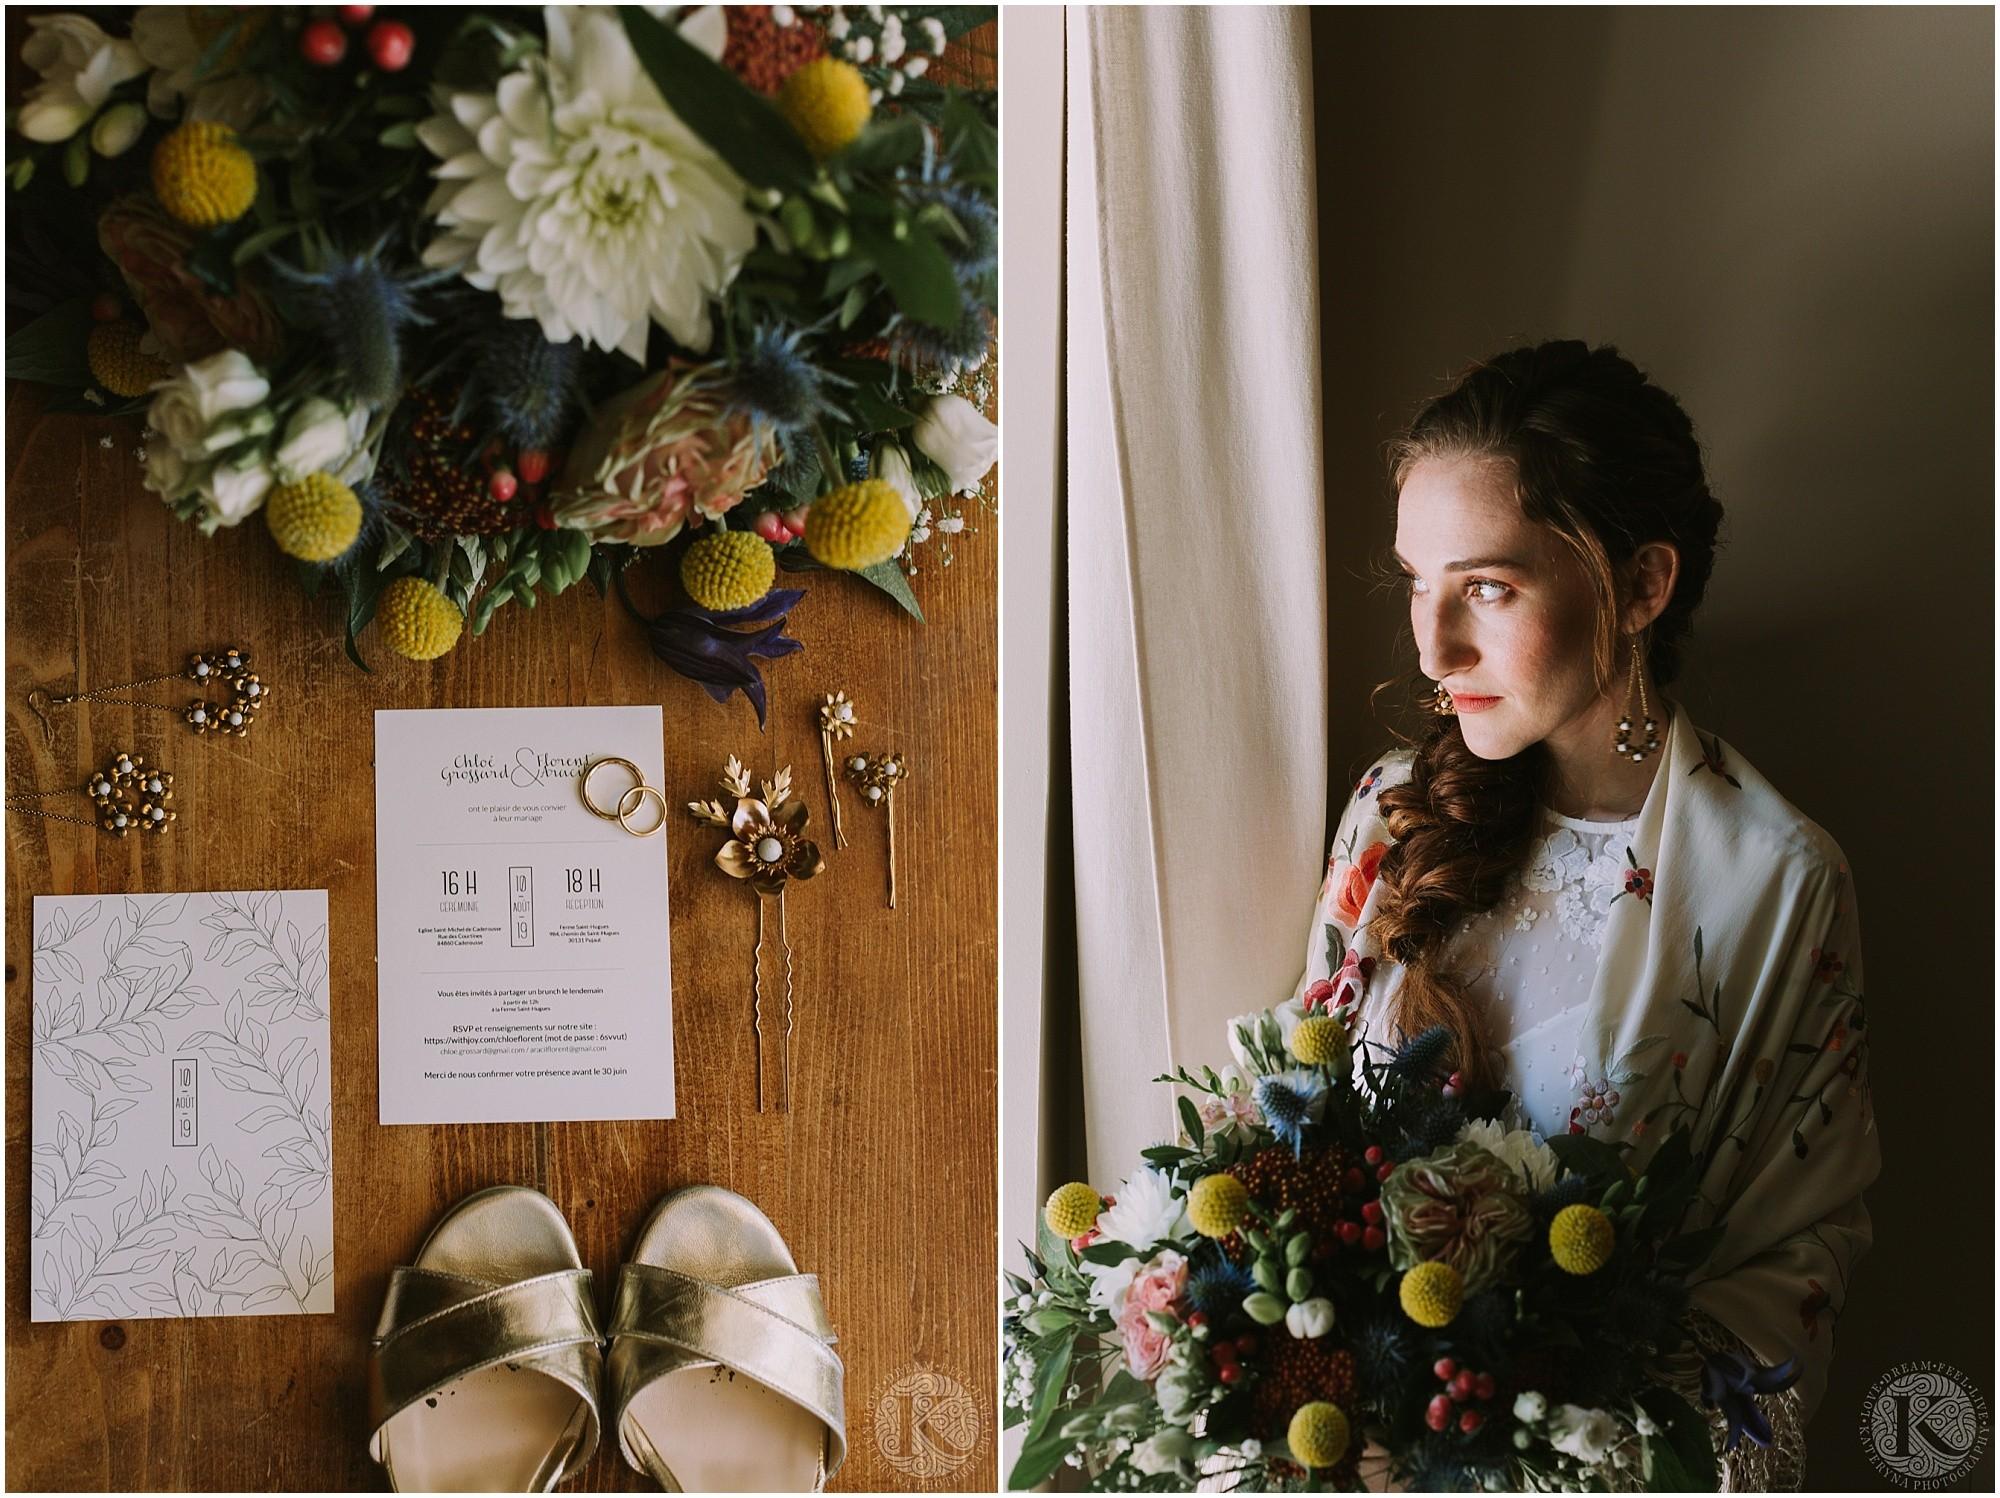 Kateryna-photos-photographe-mariage-vaucluse-provence-avignon-ferme-st-hugues_0025.jpg